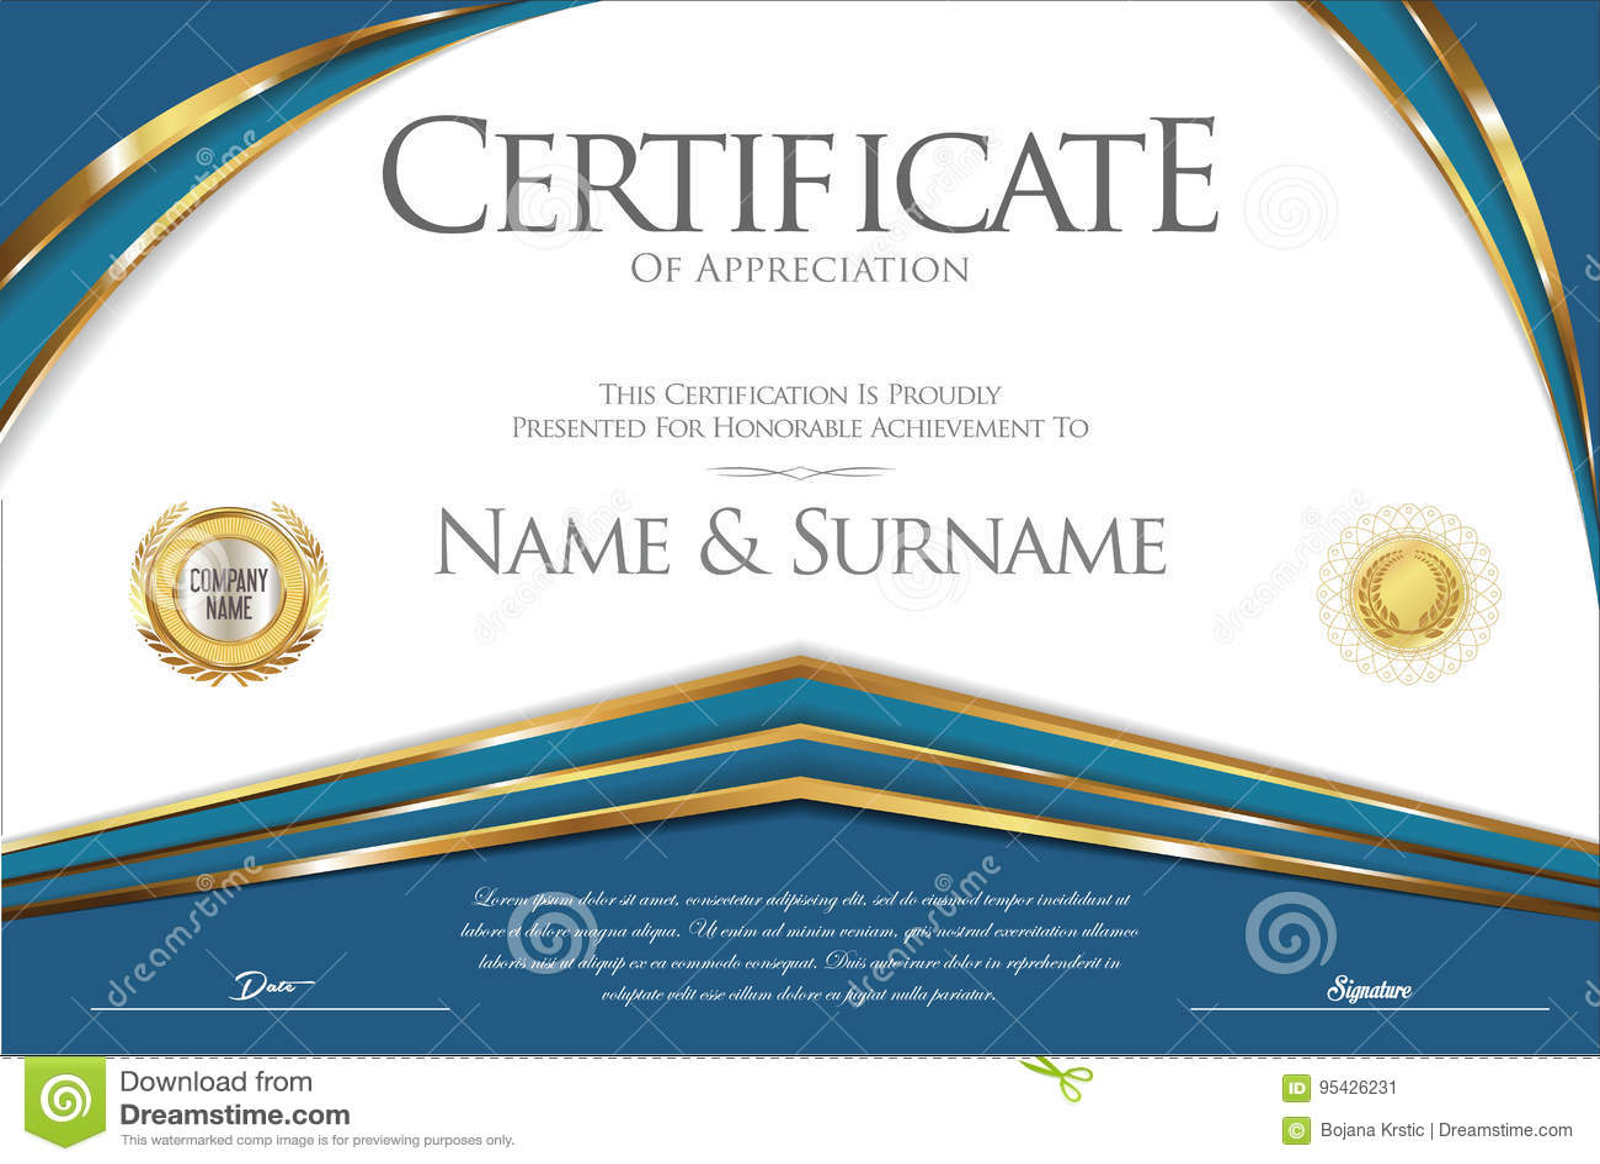 Design Vintage Bank.Certificate Or Diploma Retro Design Stock Vector Illustration Of